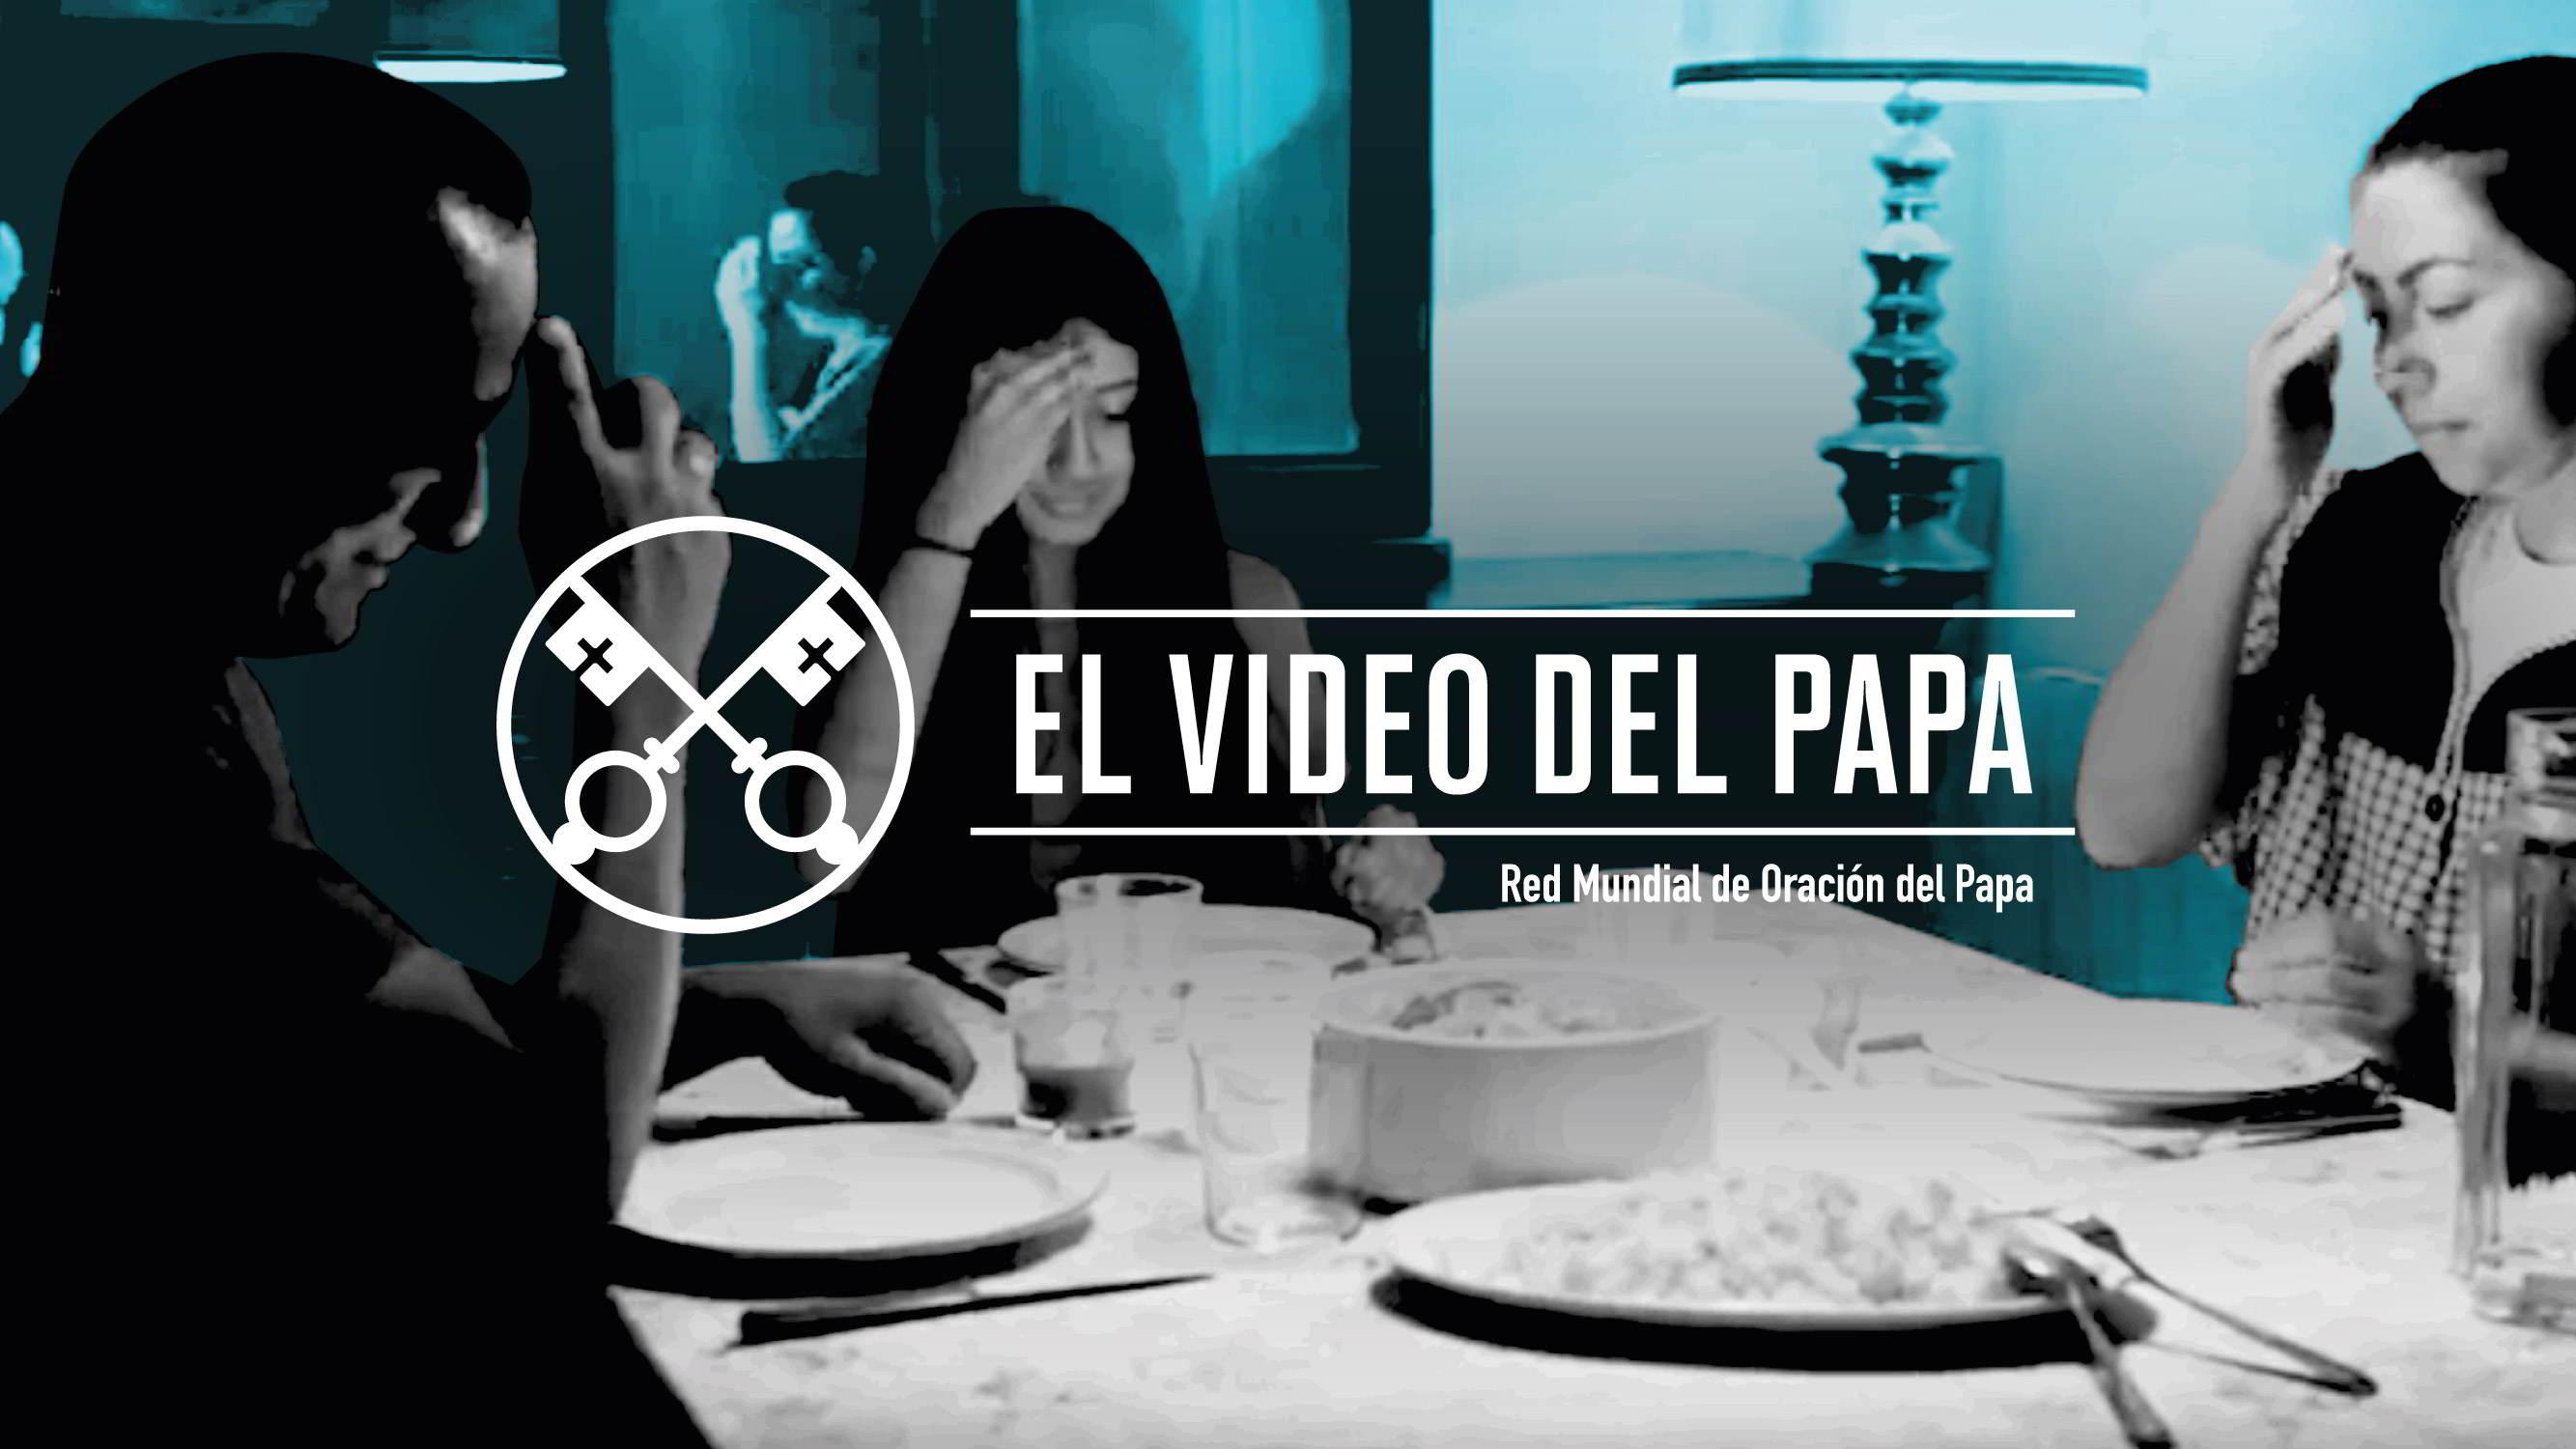 Official Image - TPV 8 2019 - 2 ES - Familias, laboratorios de humanizacion